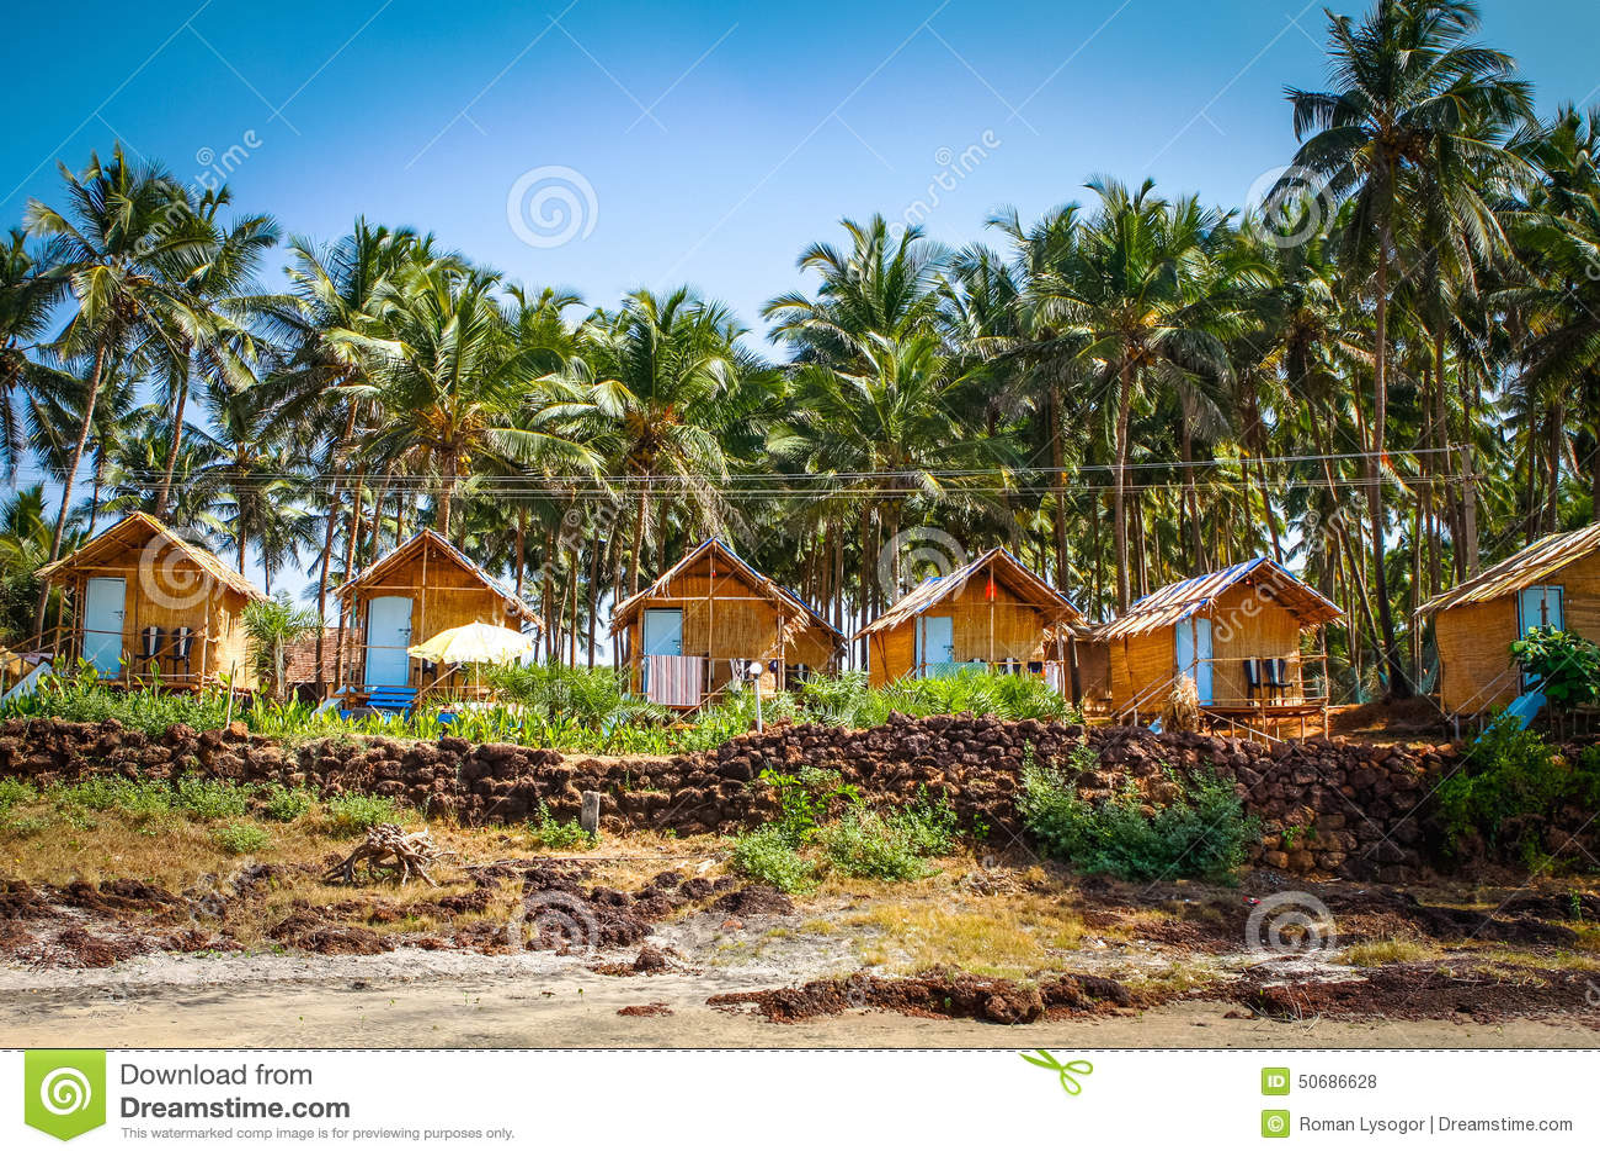 Download 在棕榈树中的平房 编辑类库存照片. 图片 包括有 户外, 放松, 旅行, 天空, 国家(地区), 平房, 掌上型计算机 - 50686628